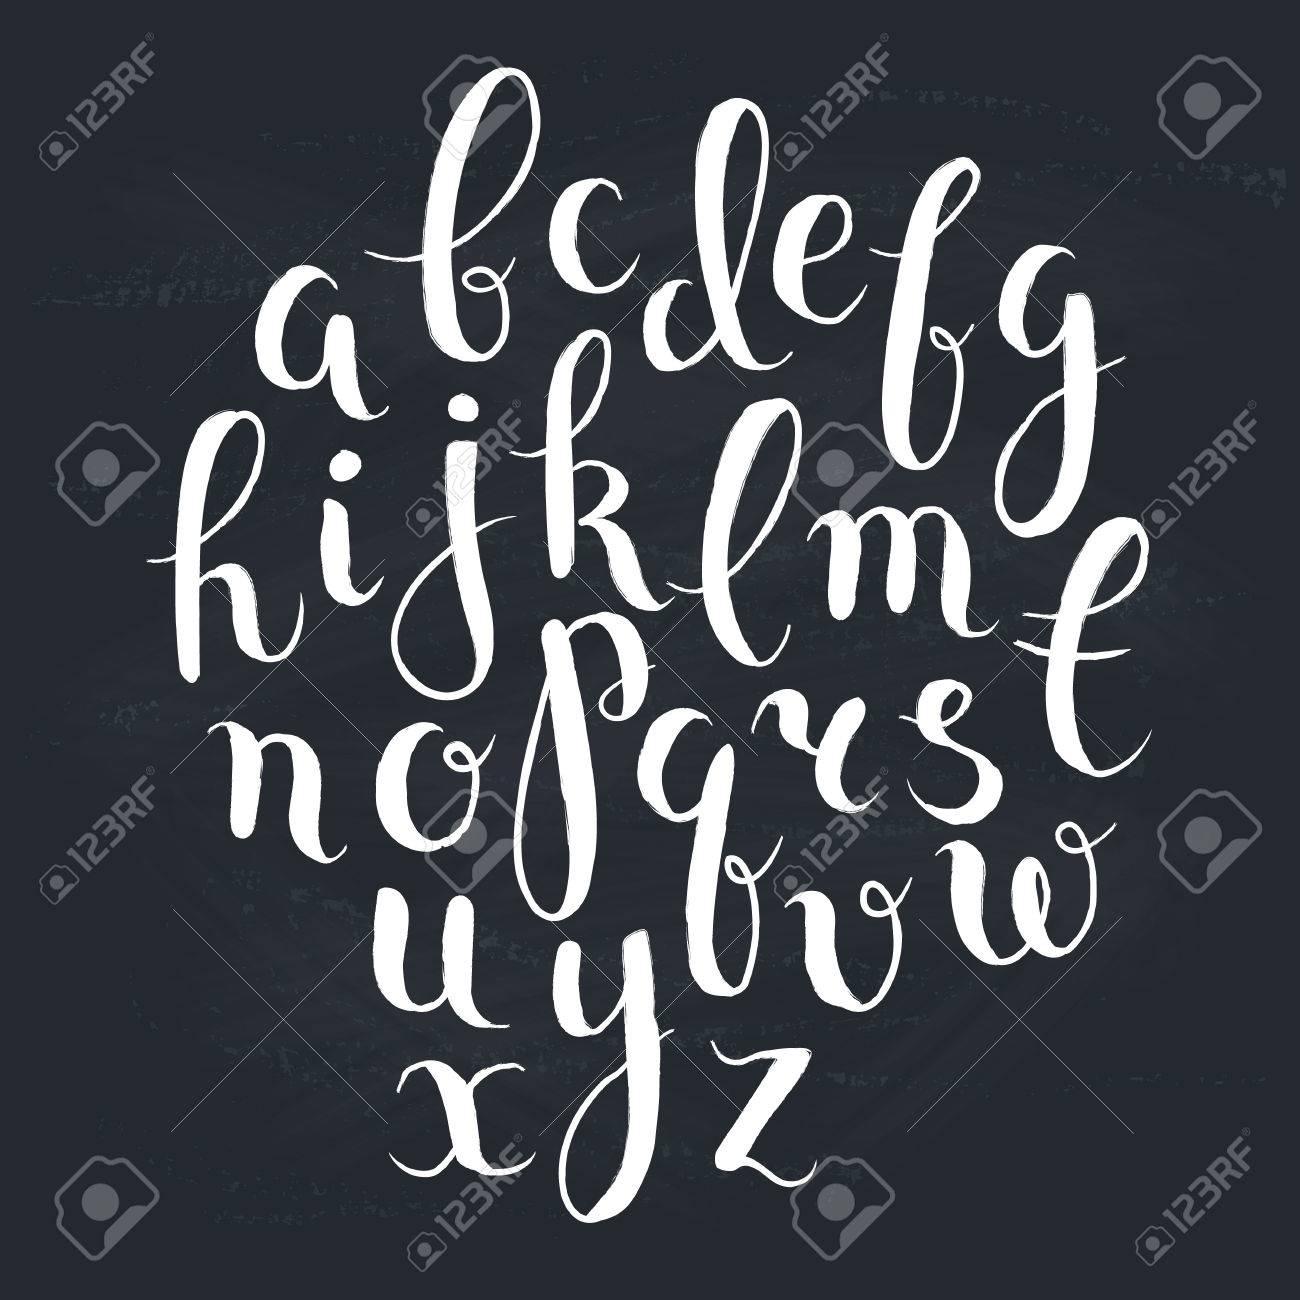 Handmade Letters Handwritten Alphabet On Blackboard Hand Drawn Calligraphy Modern Chalk Typography